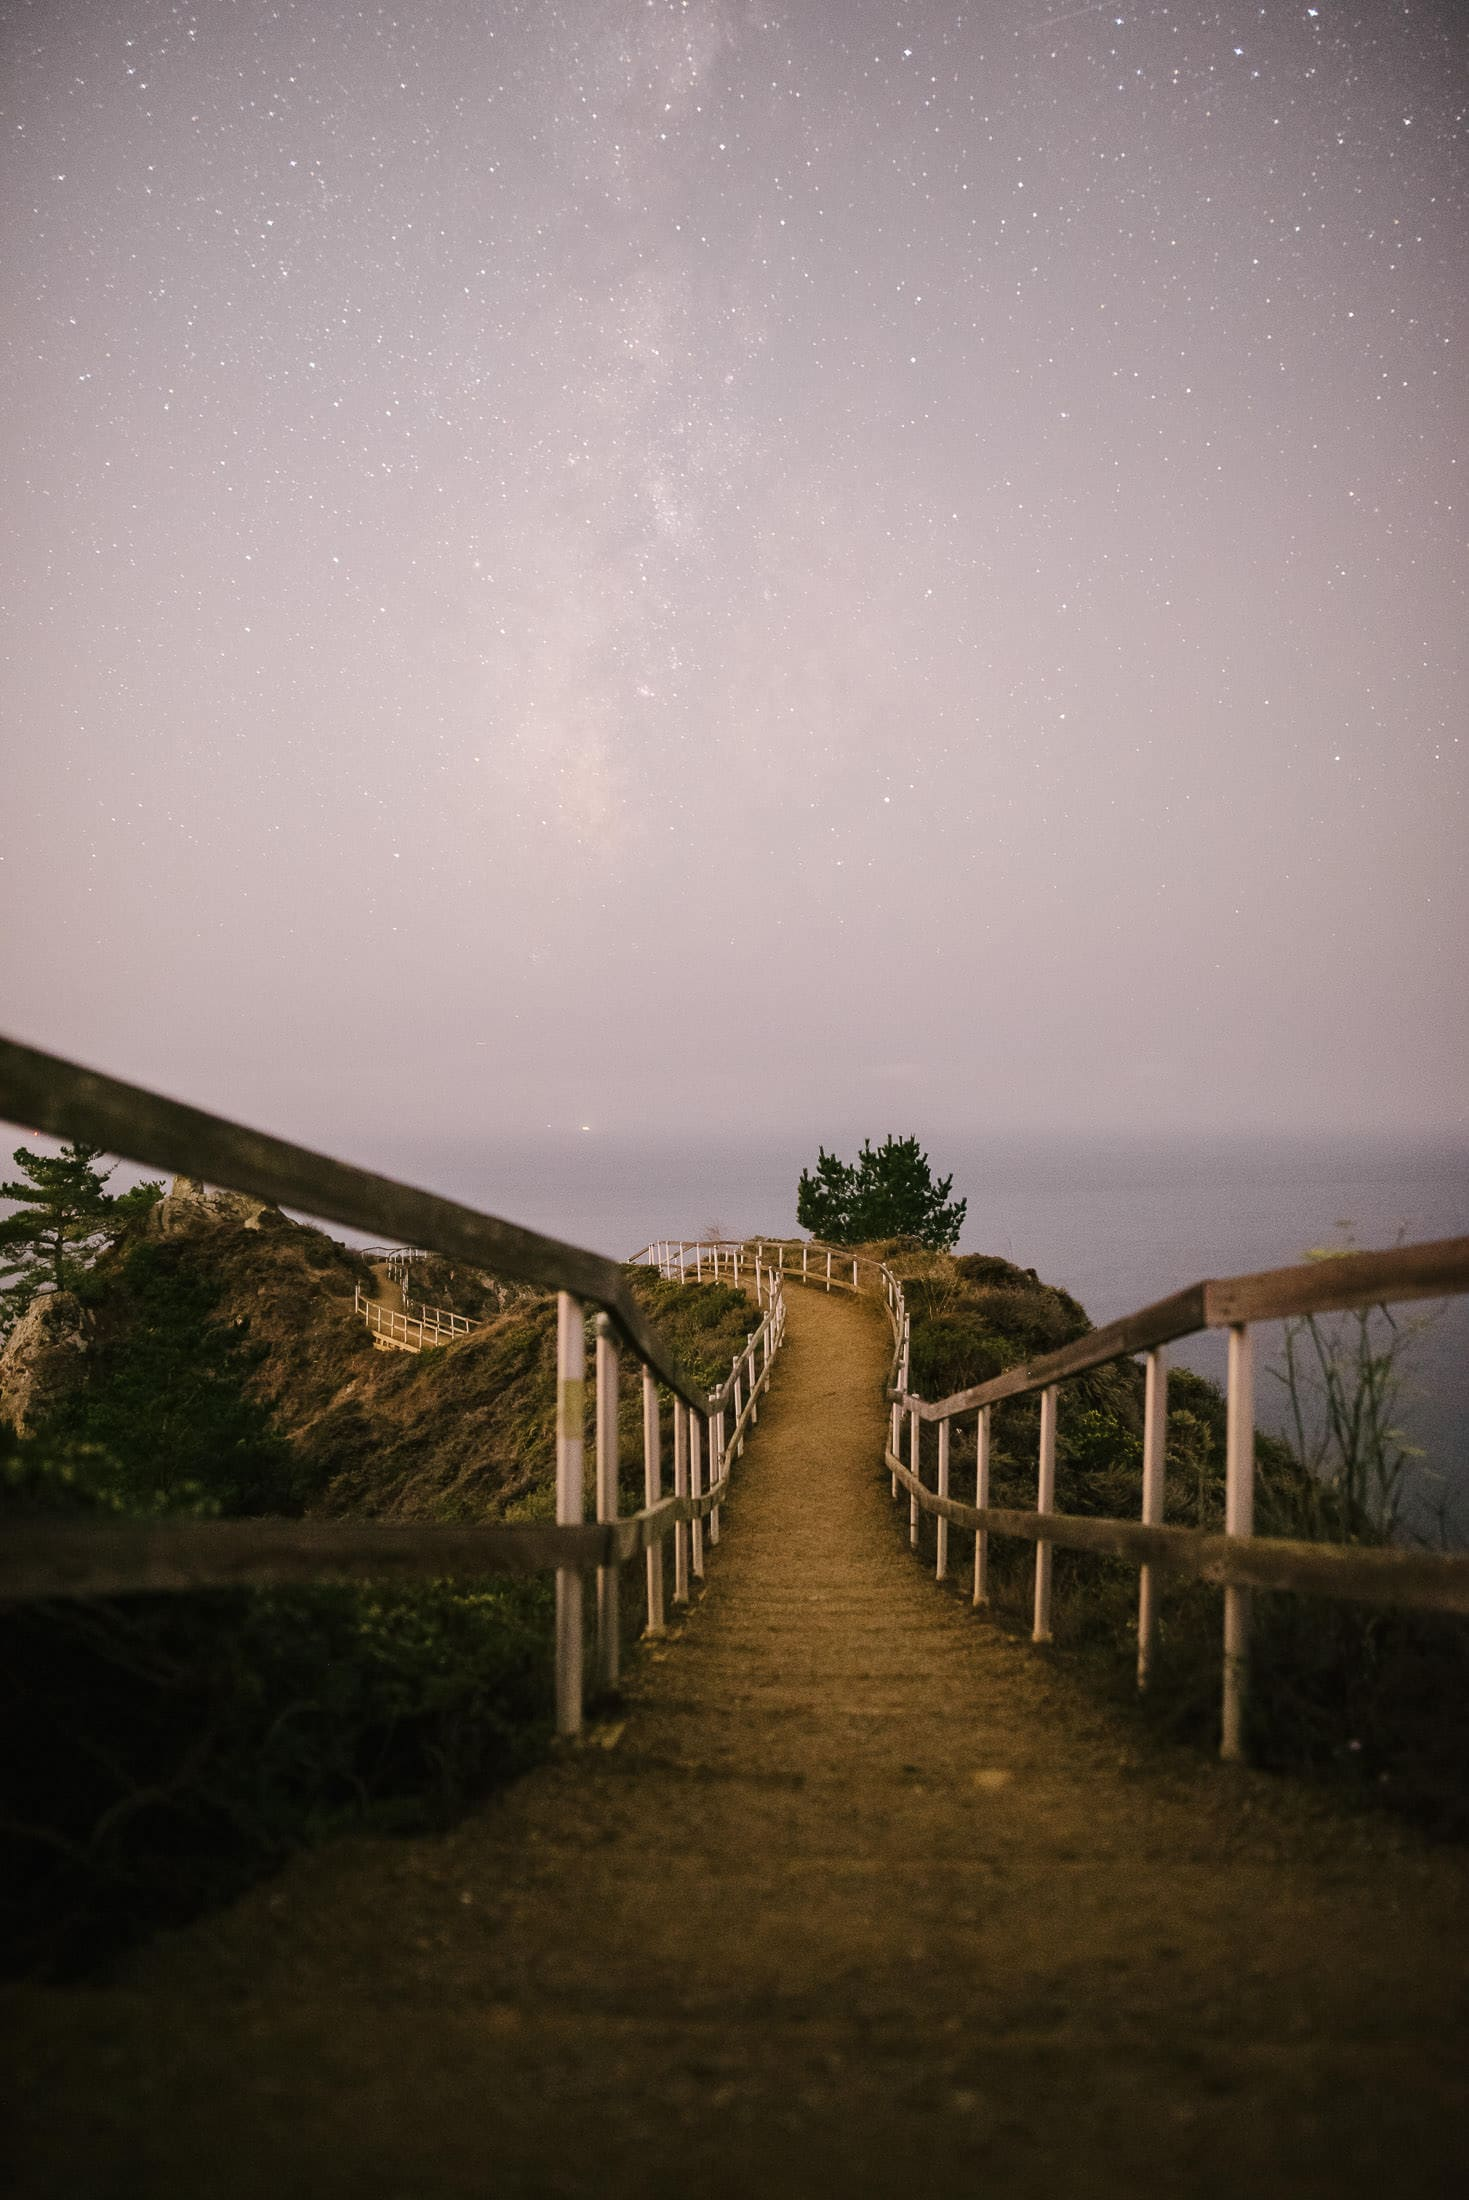 Muir Beach Lookout Night Image